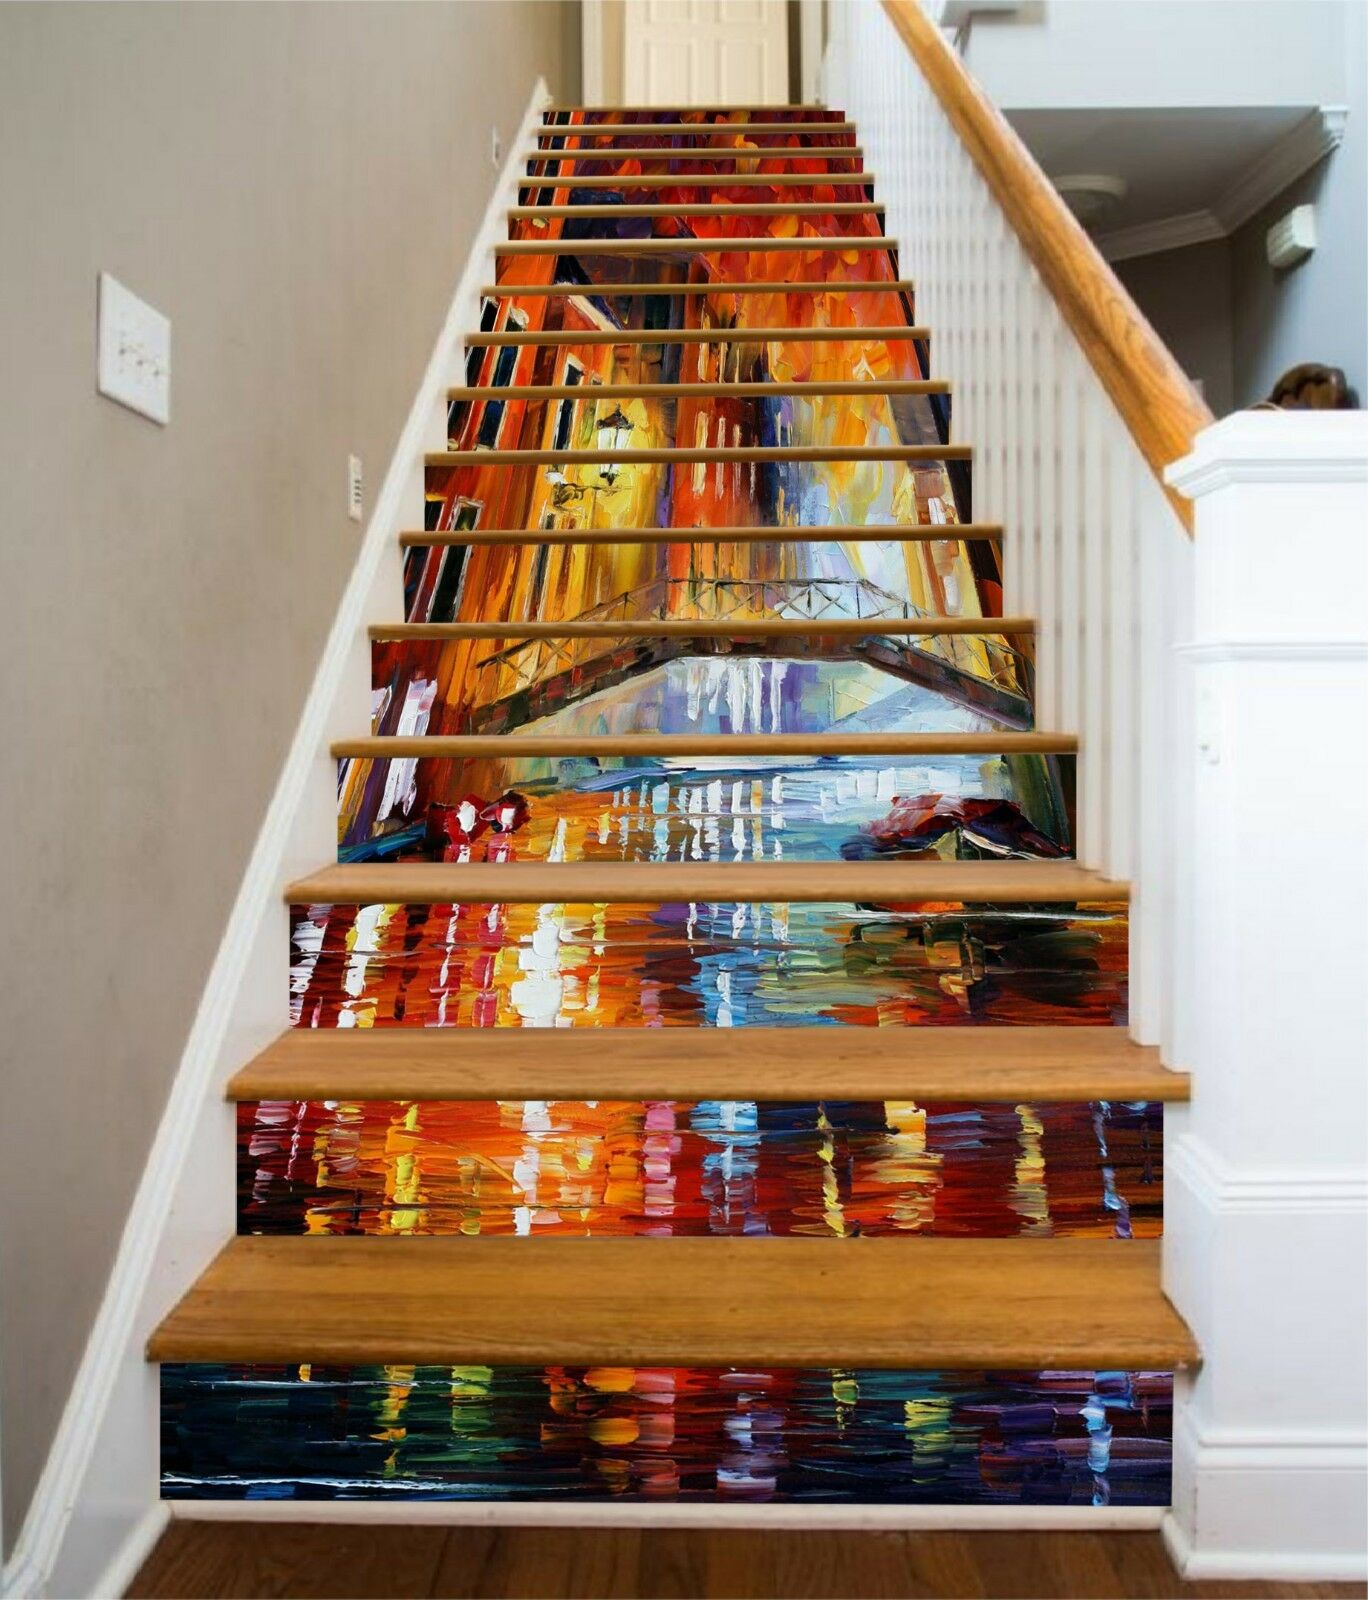 3D City Light Paint Stair Risers Decoration Photo Mural Vinyl Decal Wallpaper UK